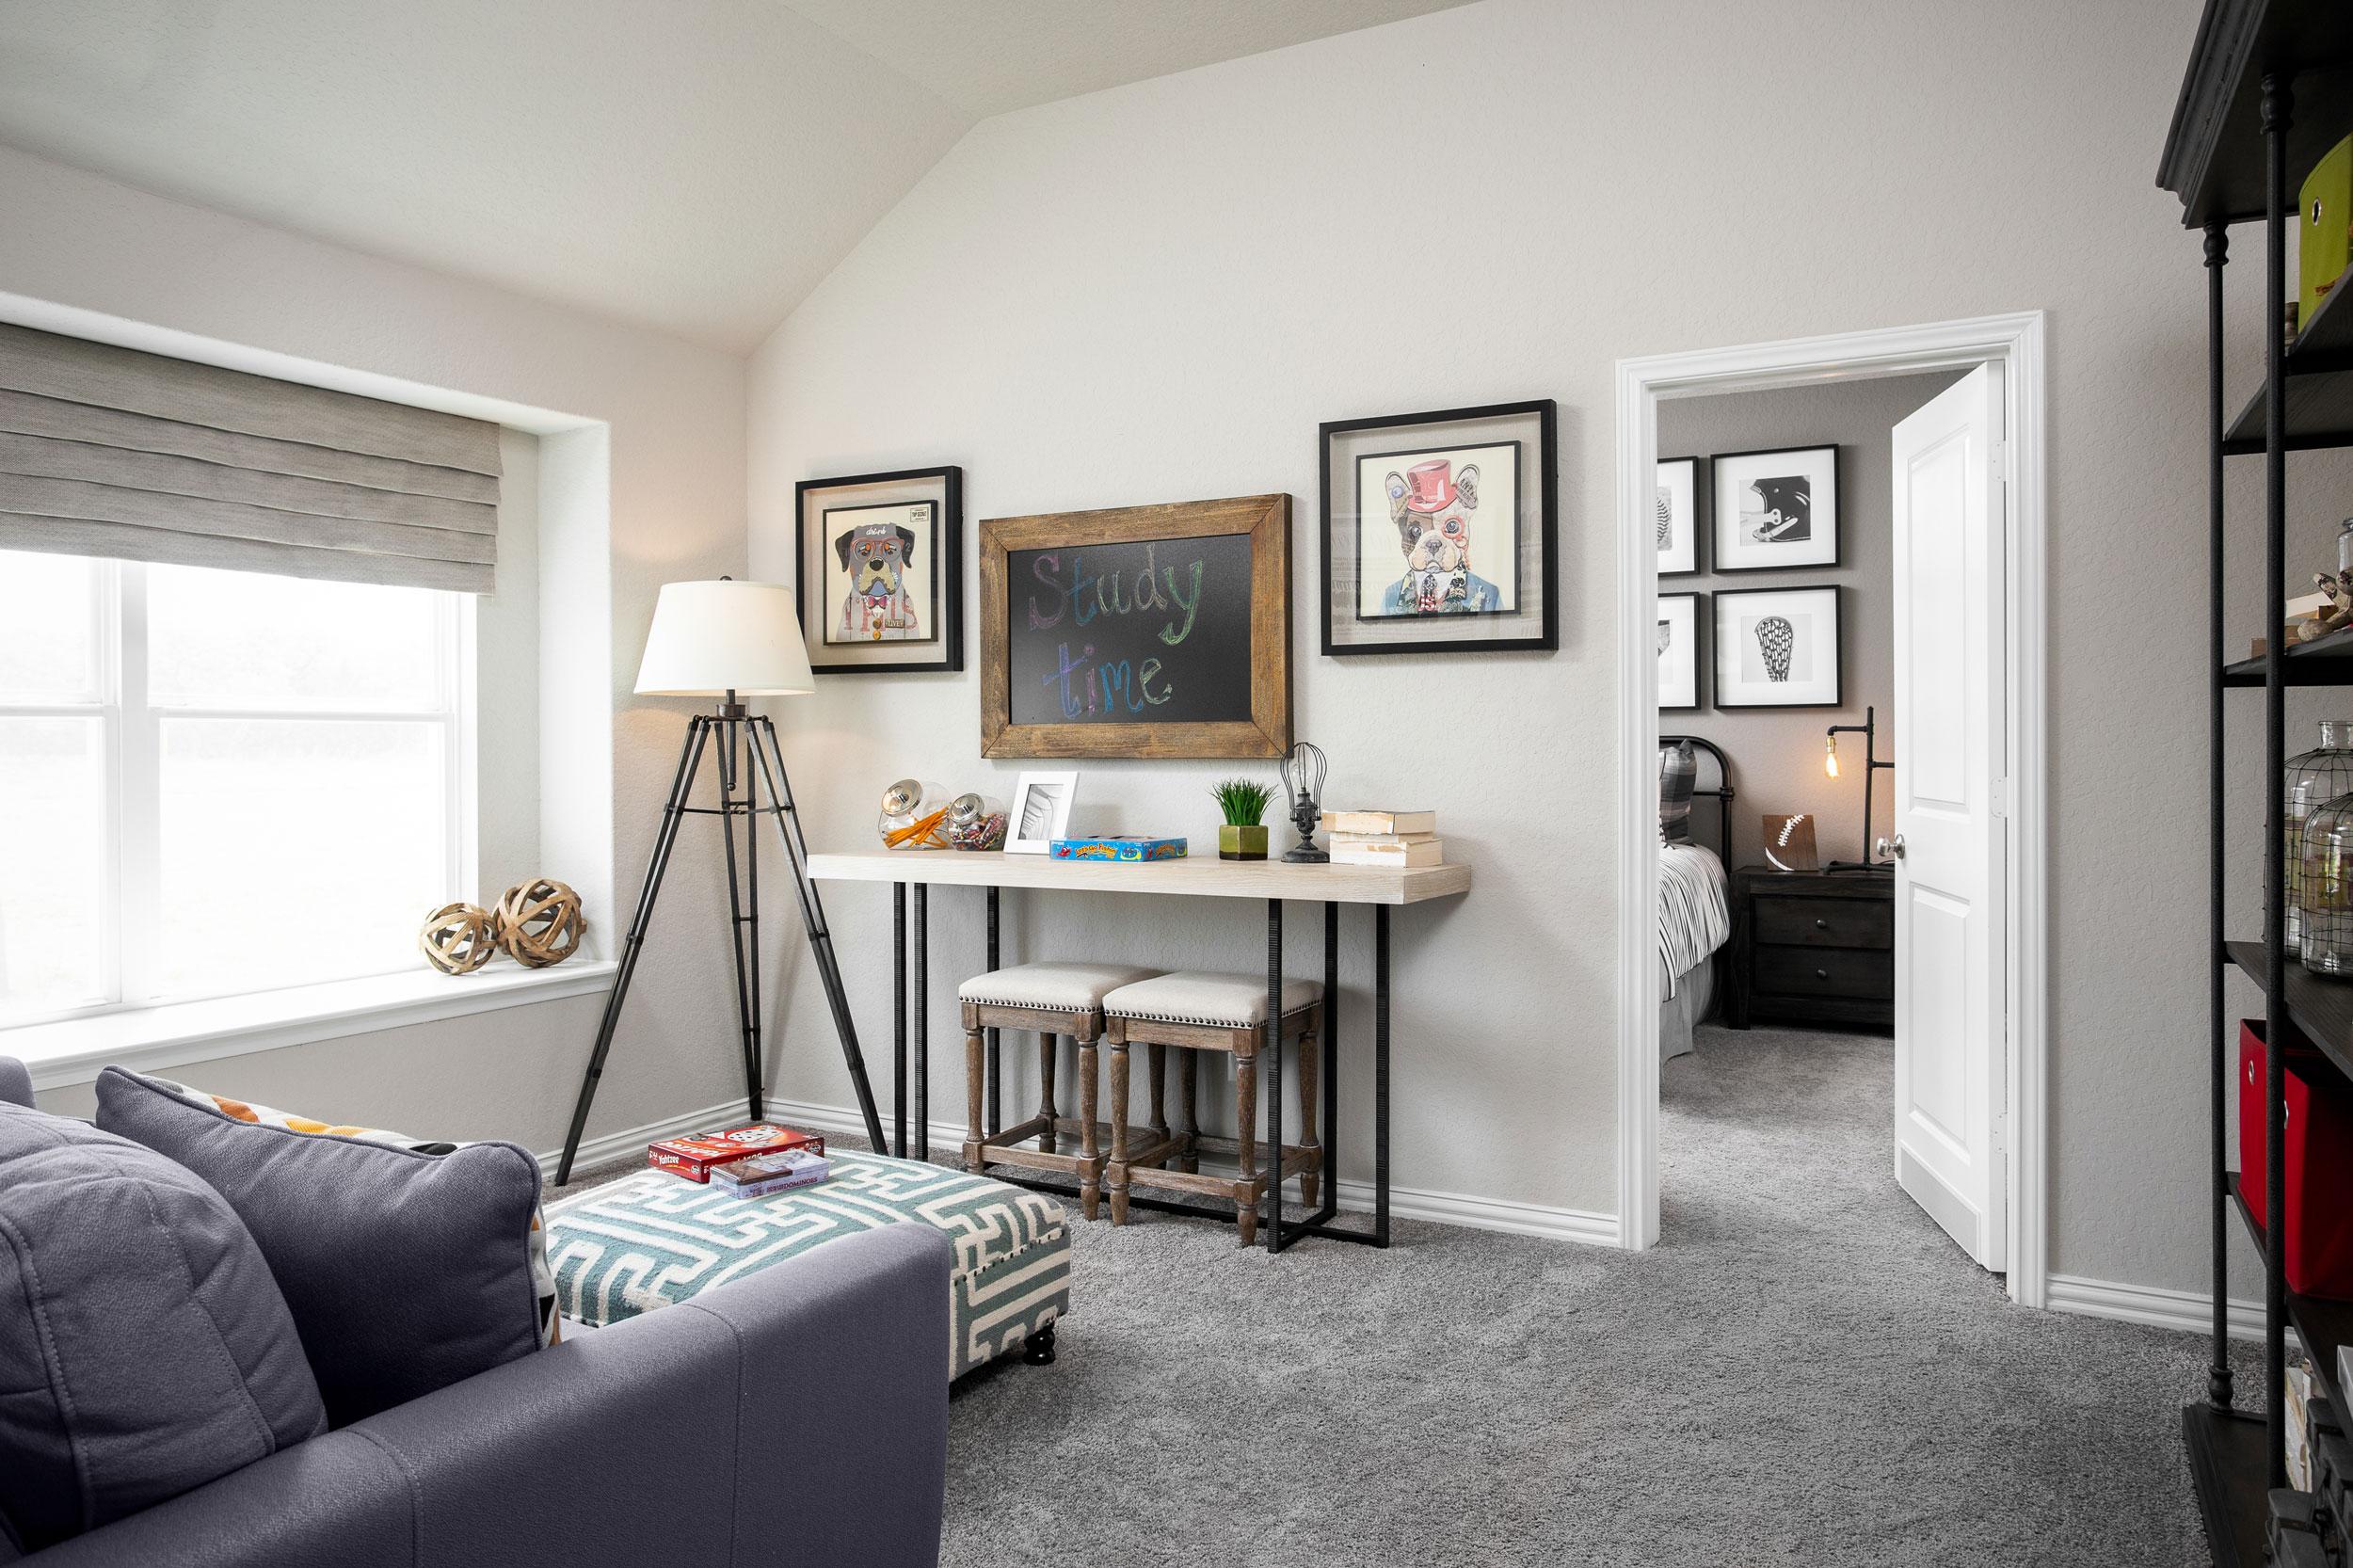 extra-living-room-design.jpg